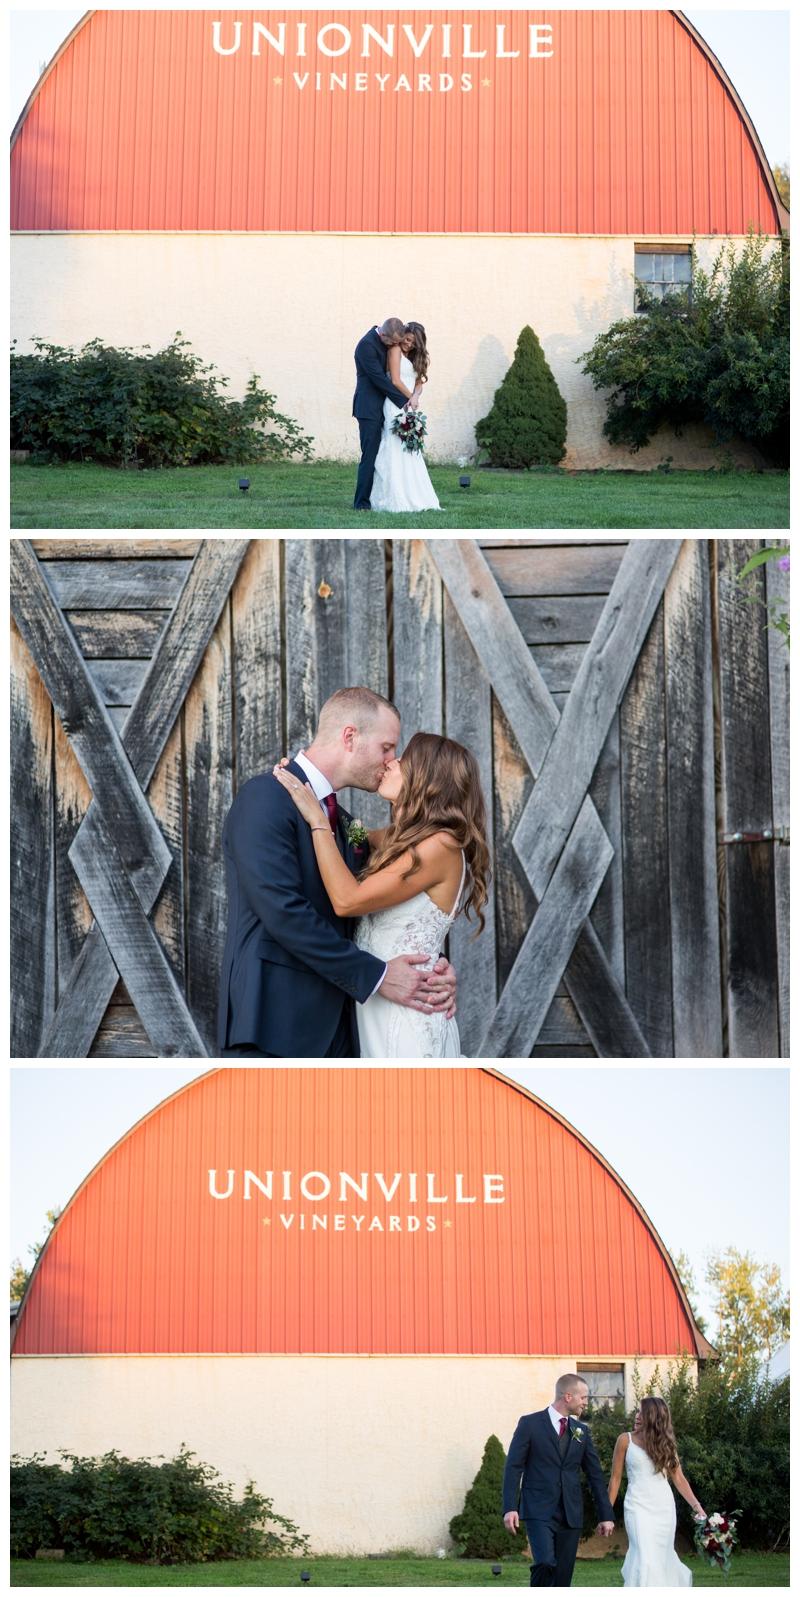 unionville-vineyards-wedding-styled-pink-photography-14.jpg